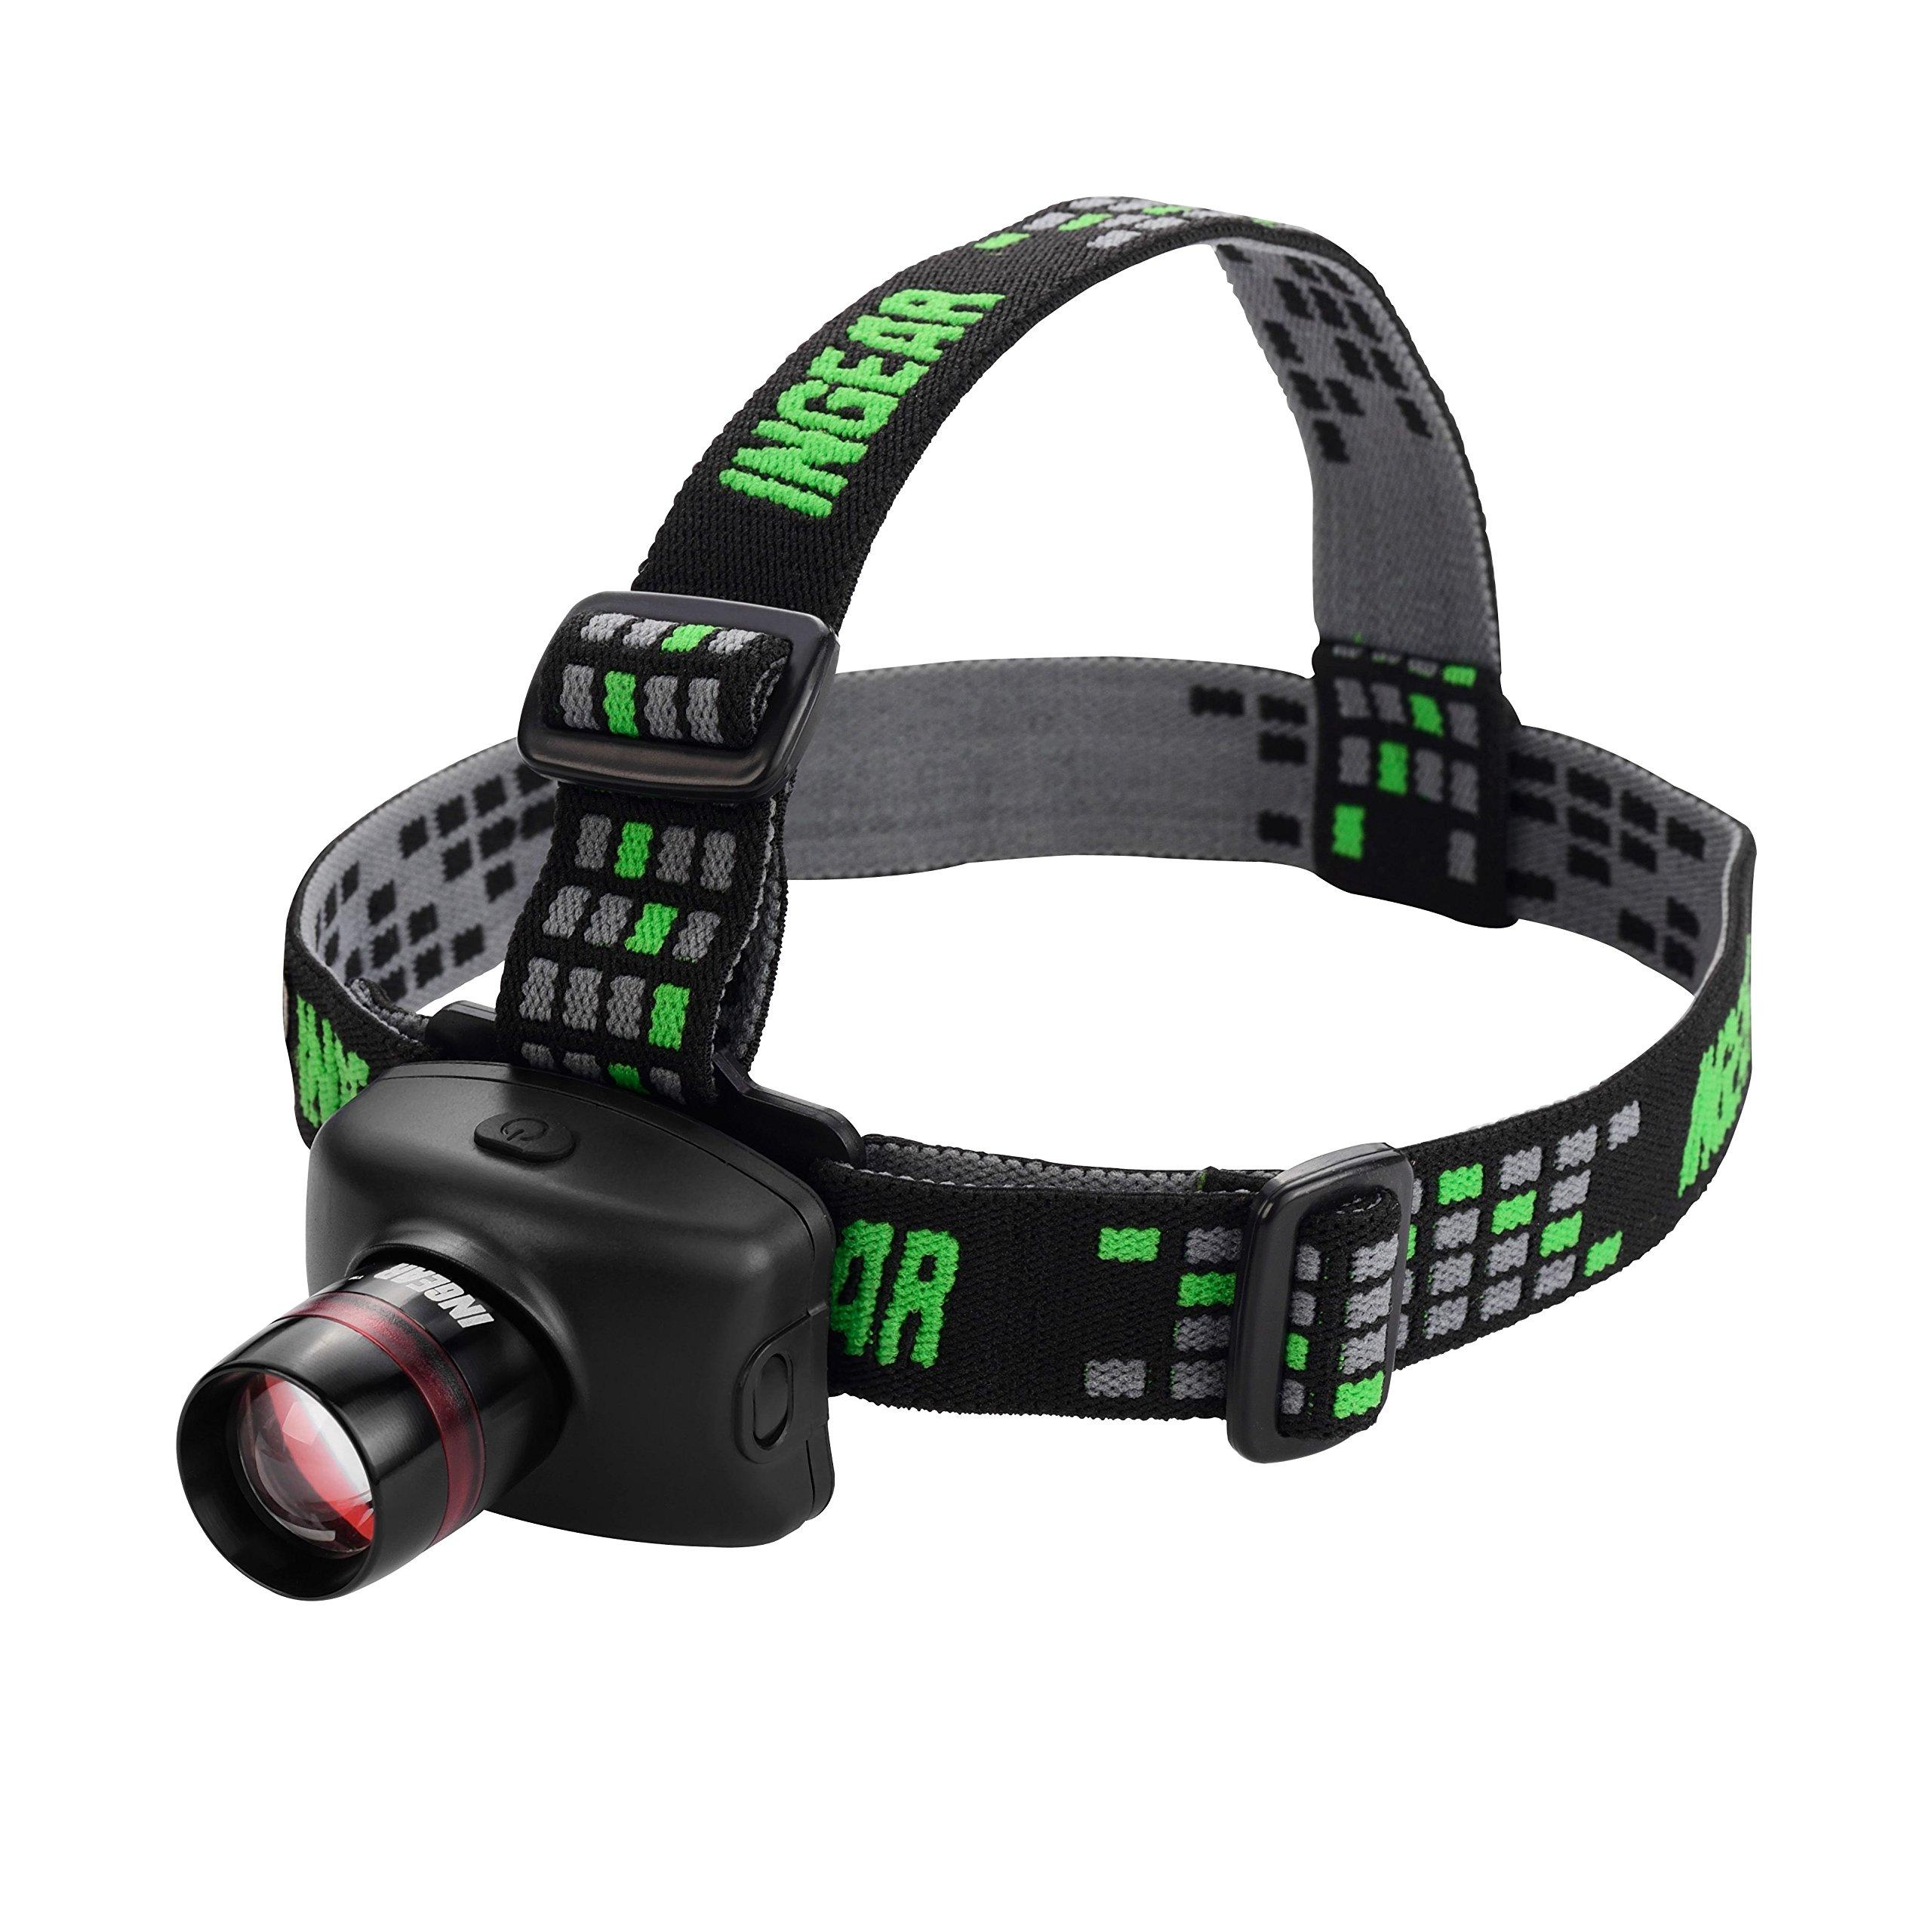 Ingear Zoomable Cree Led Headlamp Flashlight - Ultra Bright 3 Light Mode Hand.. 16